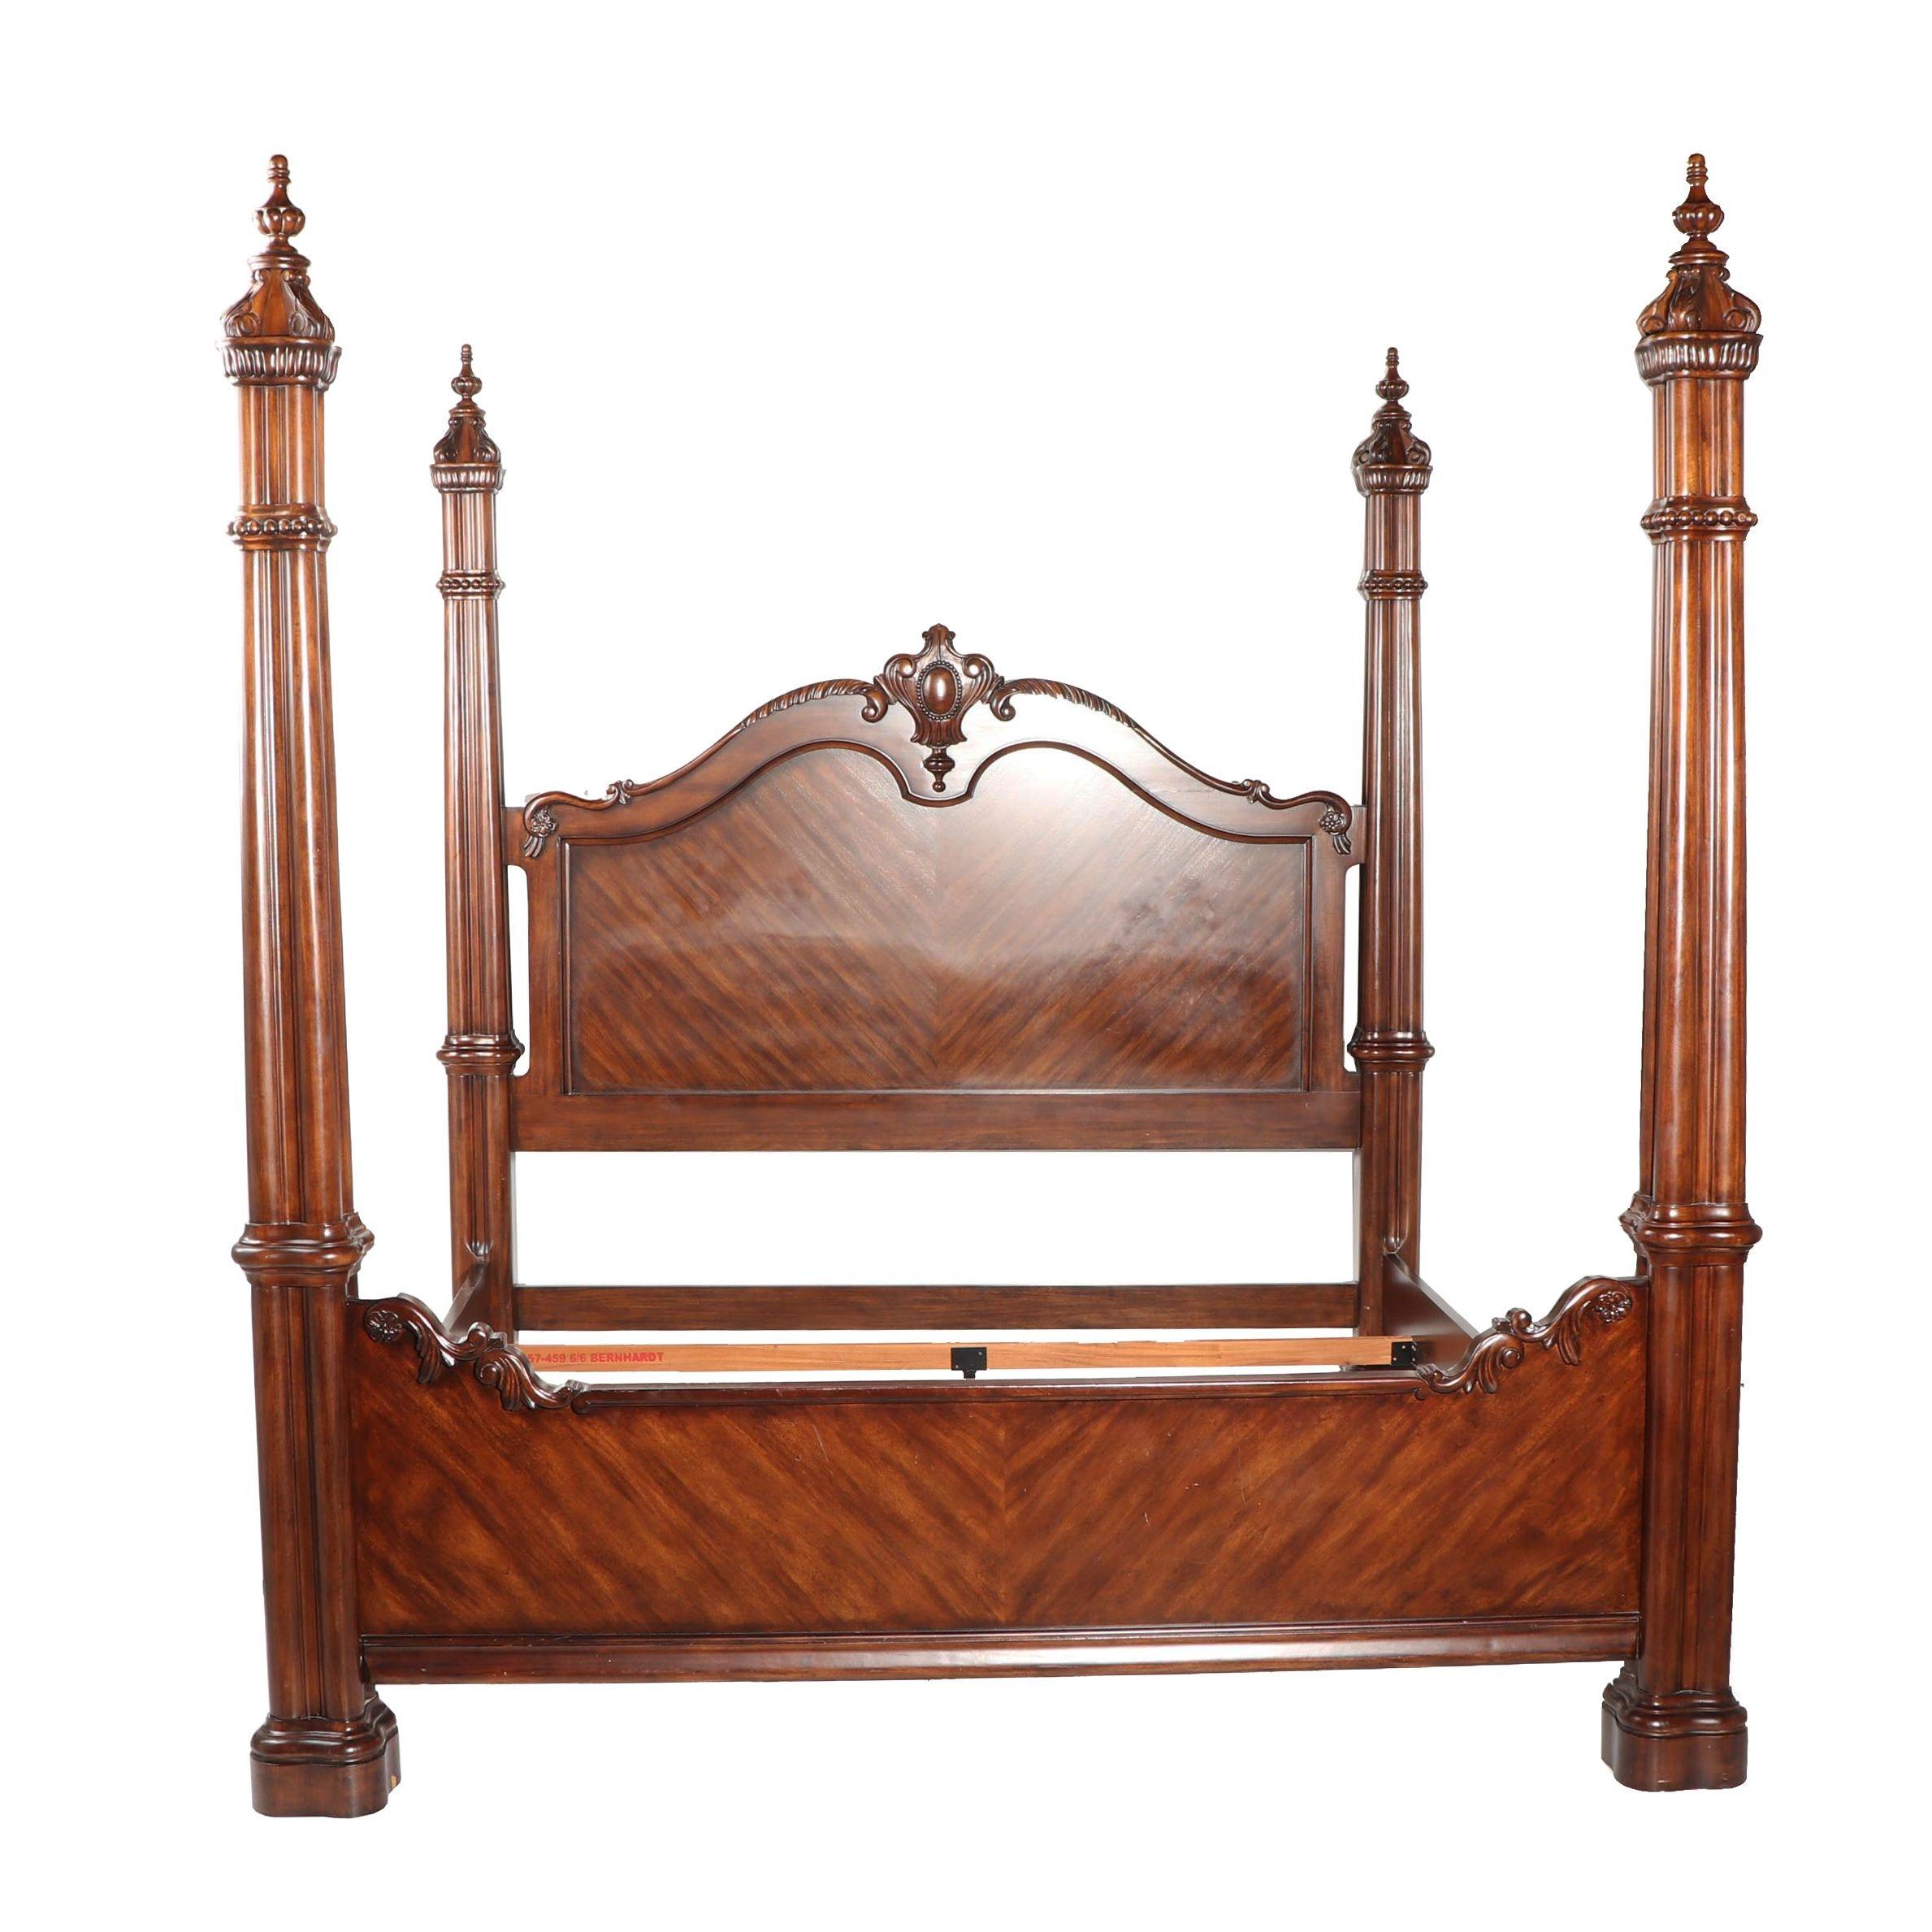 Renaissance Revival Style Mahogany King Size Bed Frame, 21st Century